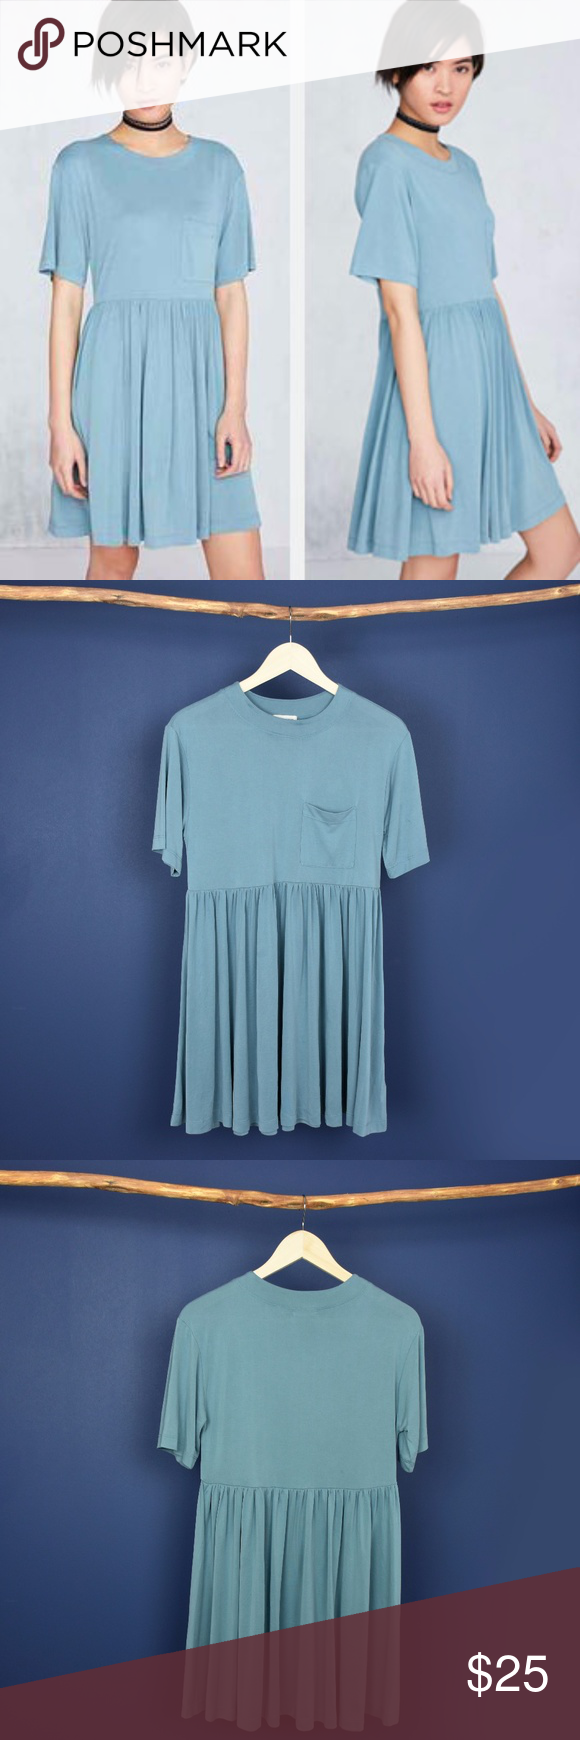 83899cfba11a silence + noise Cupro Babydoll Mini T-Shirt Dress Loose fitting ...